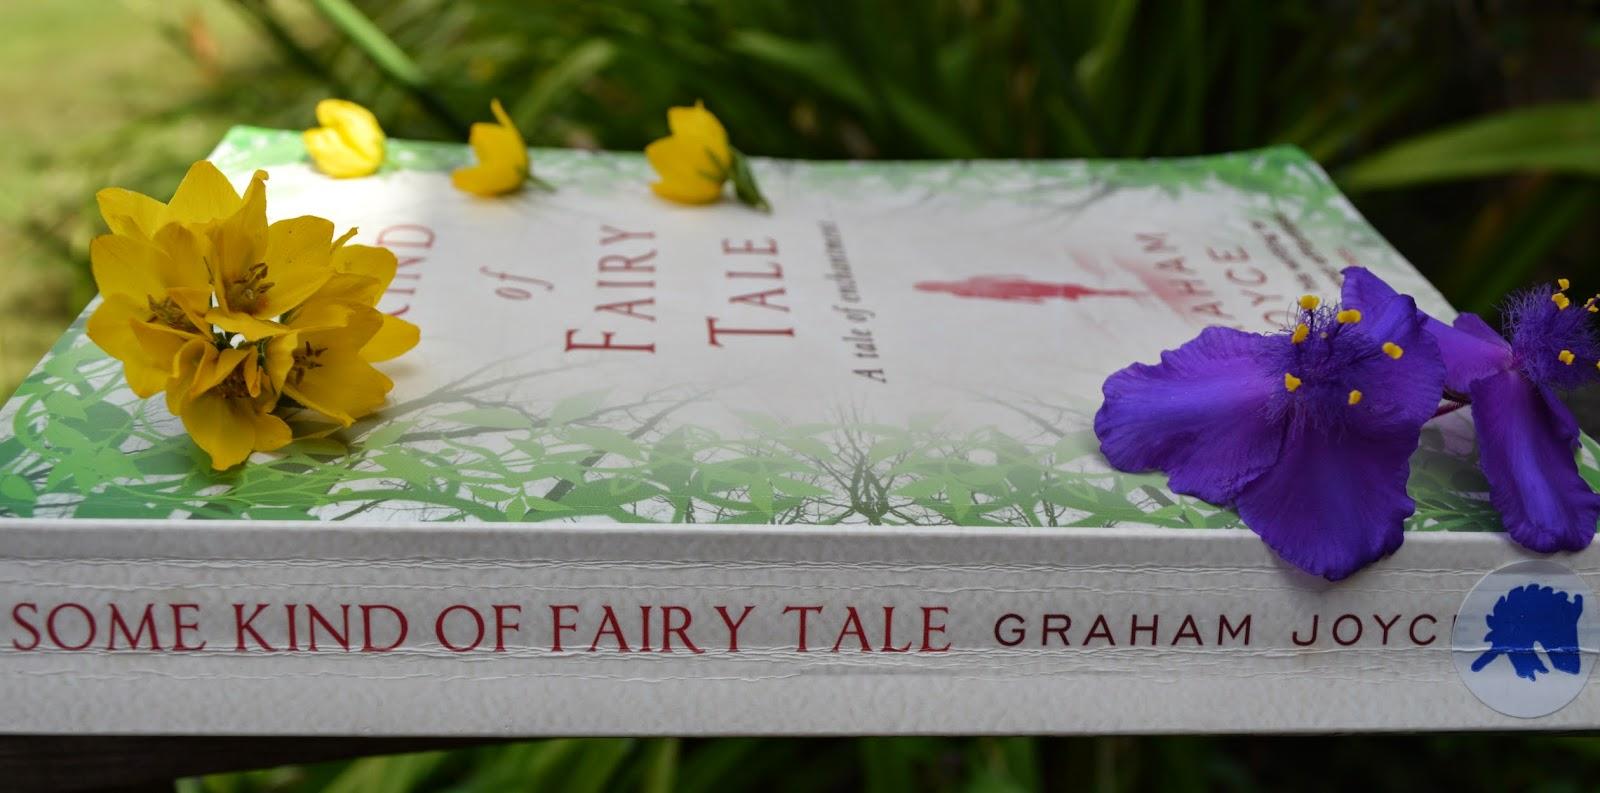 Some Kind of Fairy Tale, Tara, Bluebells, novel, fairies,  book cover, review, Graham Joyce, UK edition, photo, photograph, fairy tale,